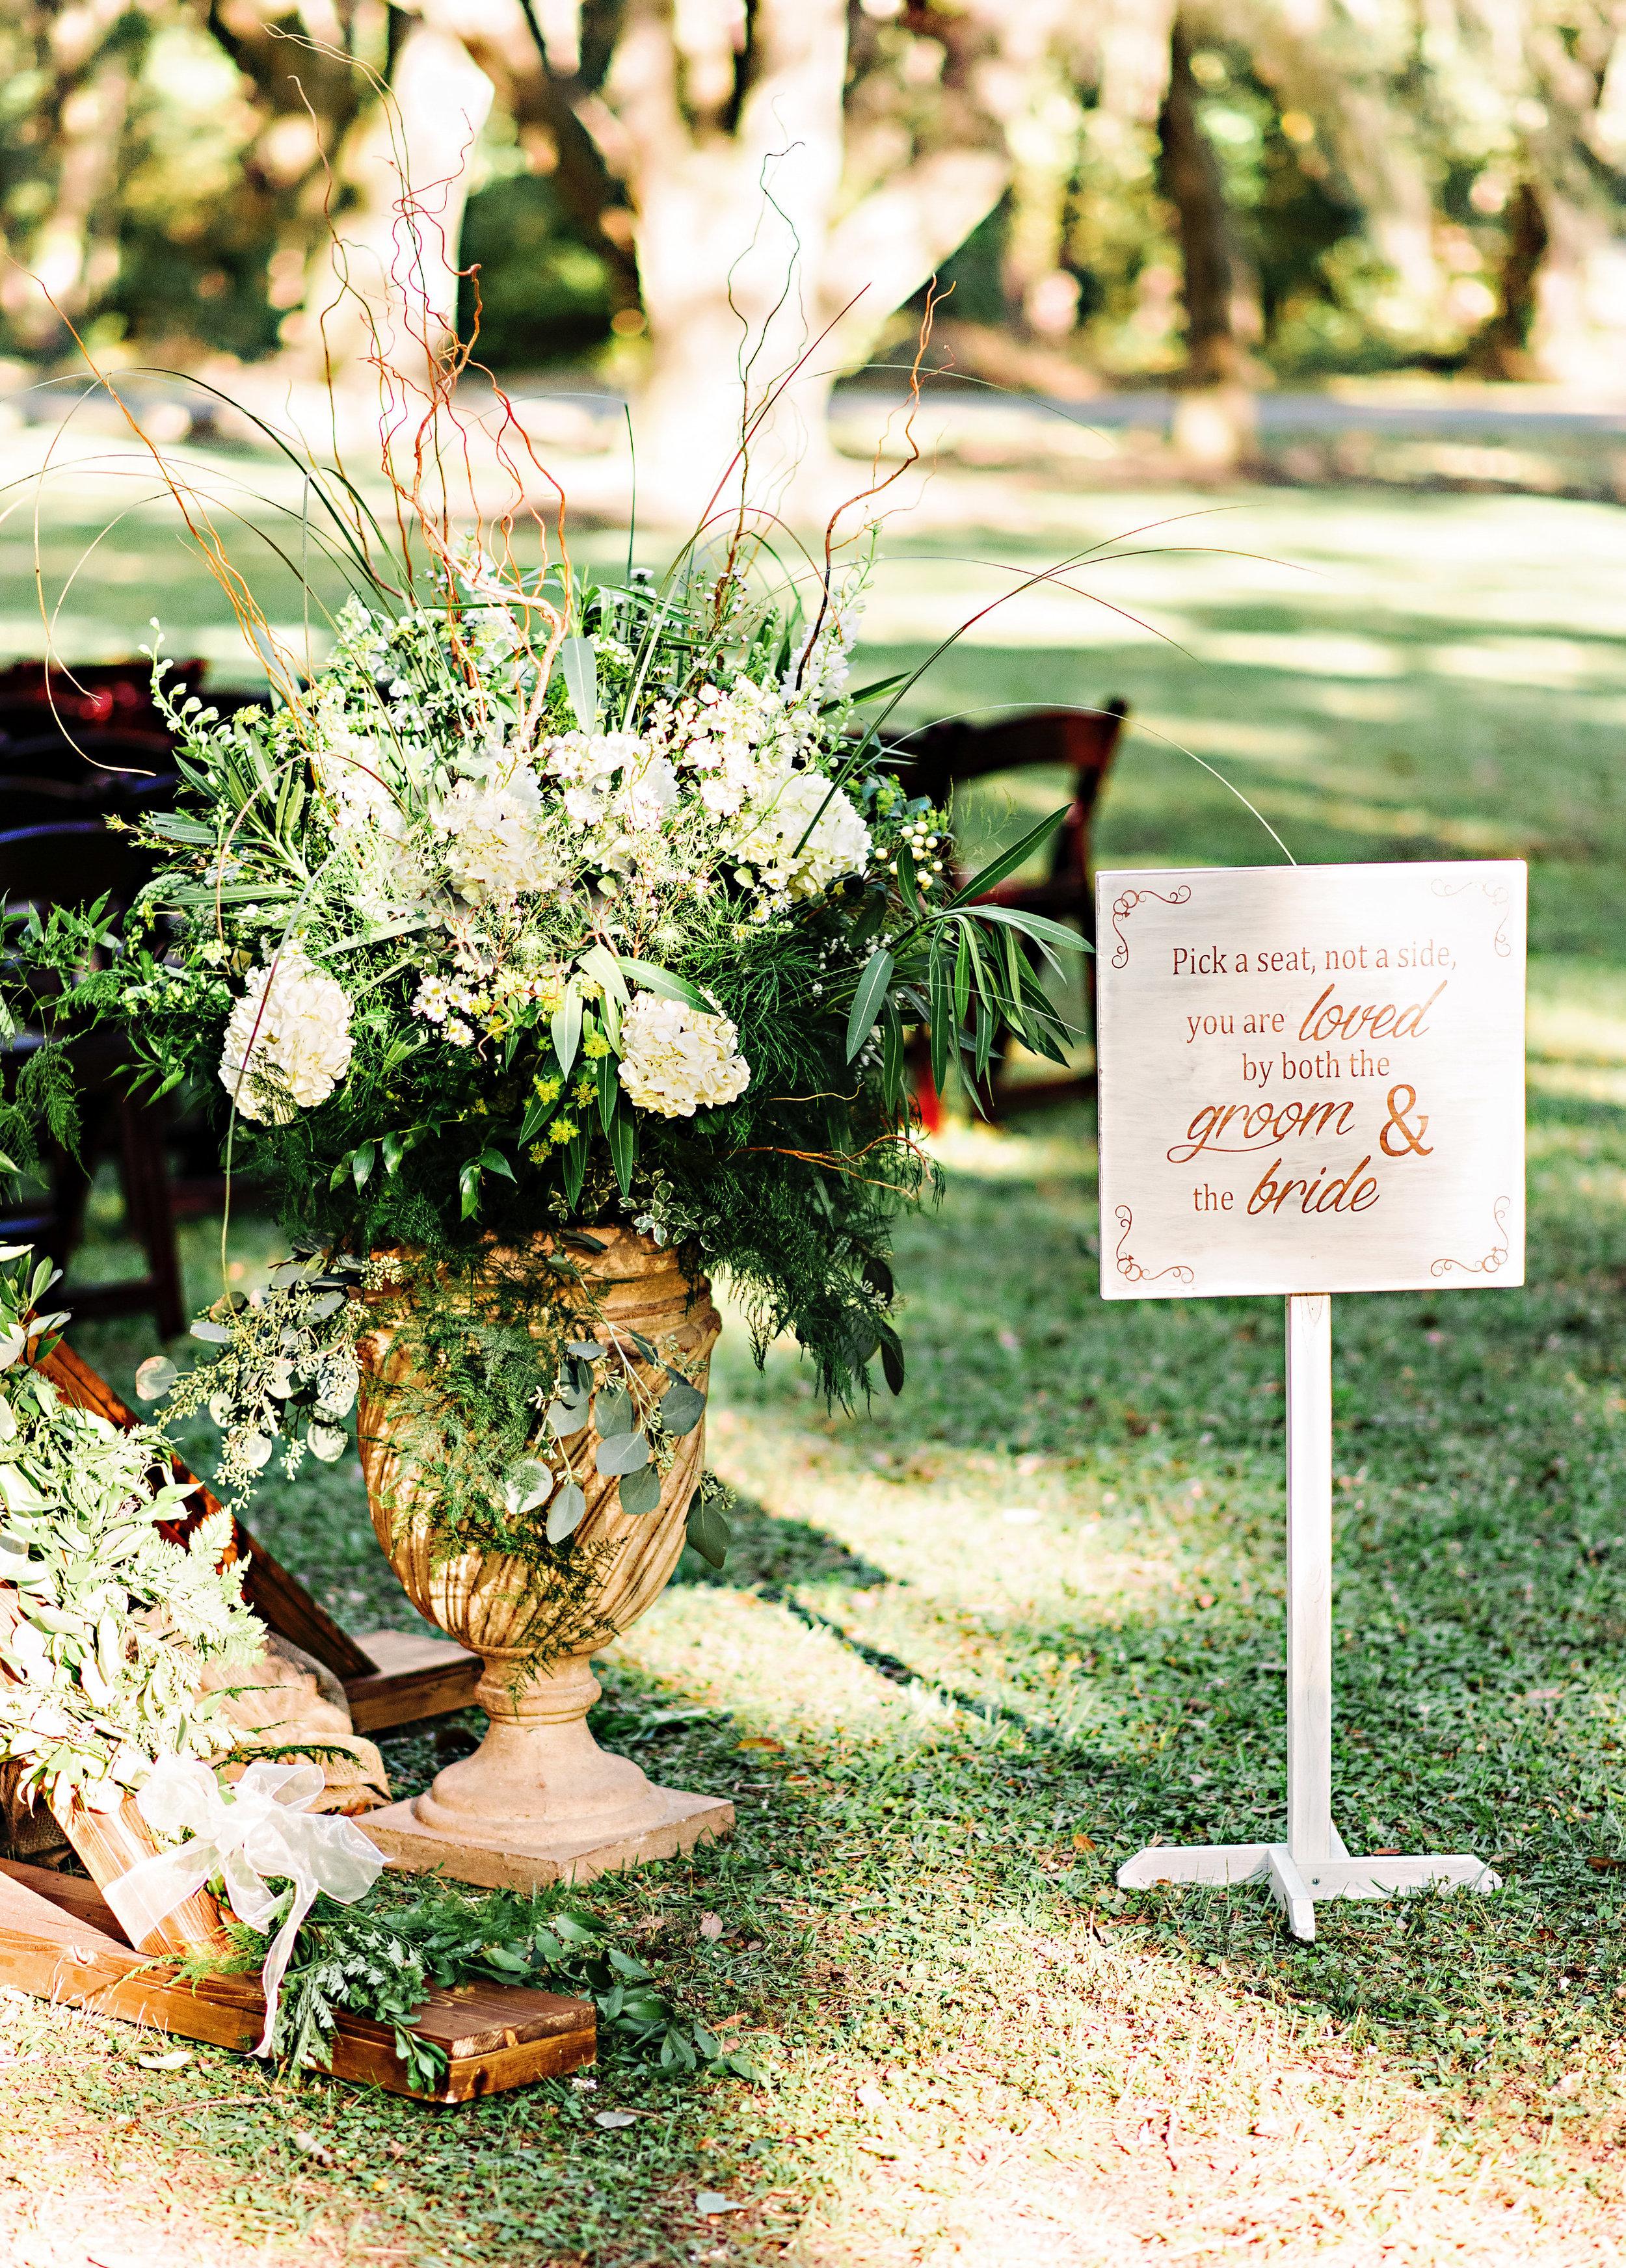 Teal wedding at Litchfield Plantation by Corina SilvaTeal wedding at Litchfield Plantation by Corina Silva